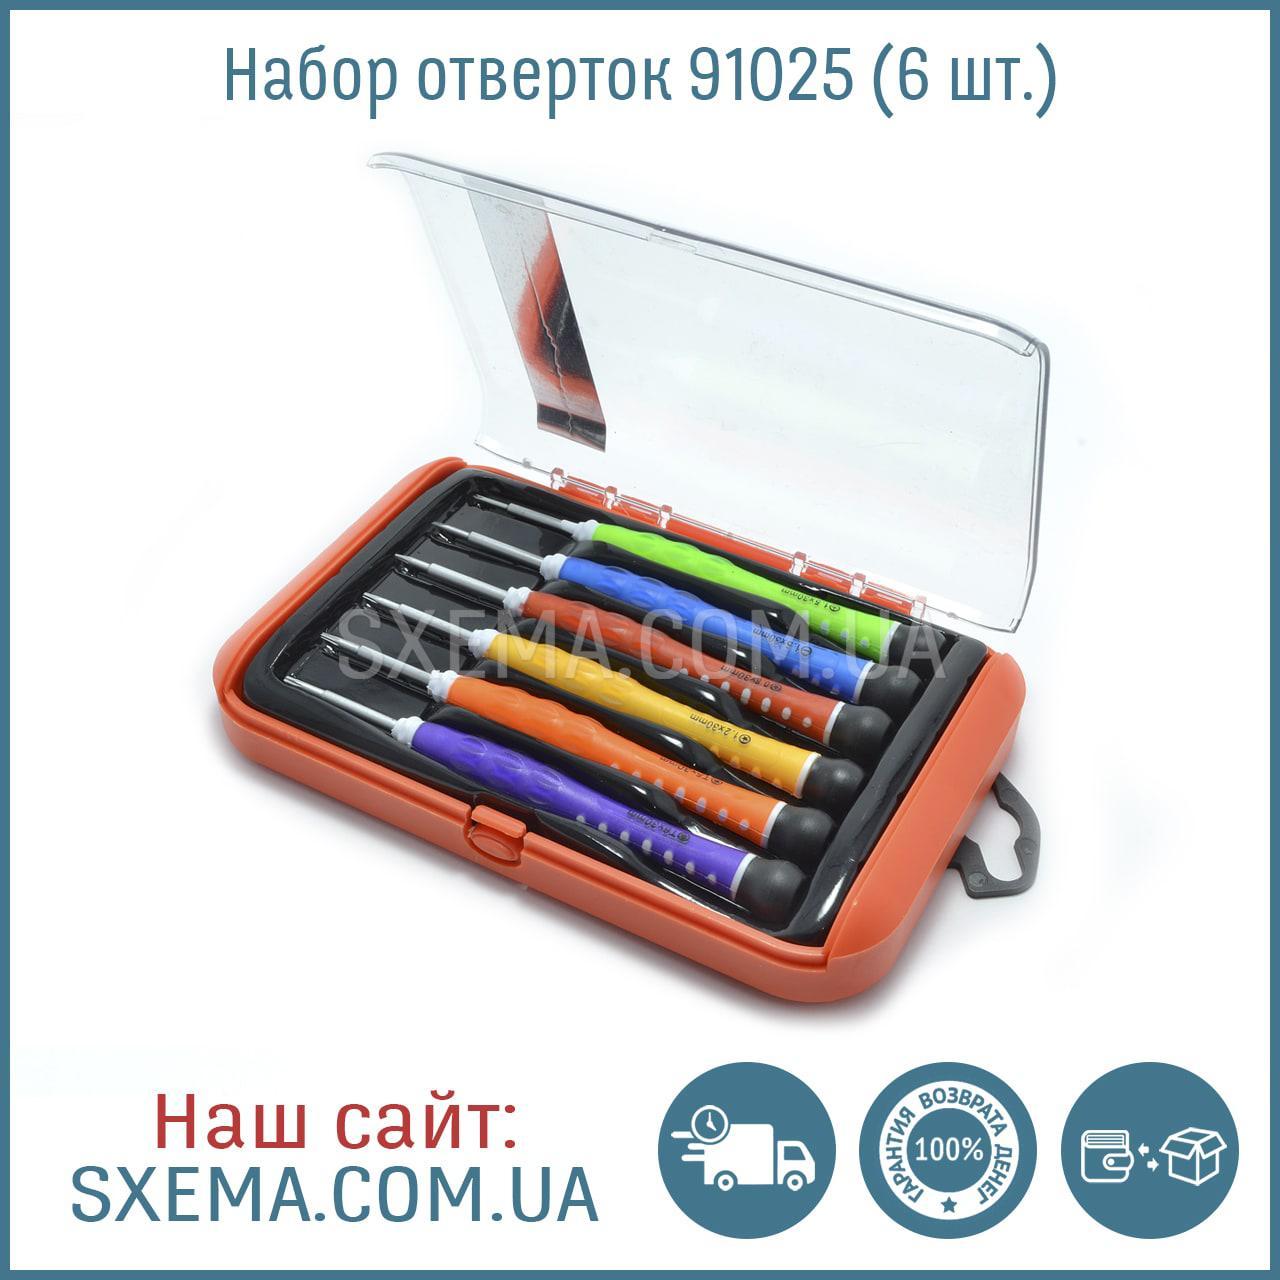 Набор отверток YaXun 91025  Torx T5, T6, Ph +1.5, Iphone 0.8*, Mac 1.2*